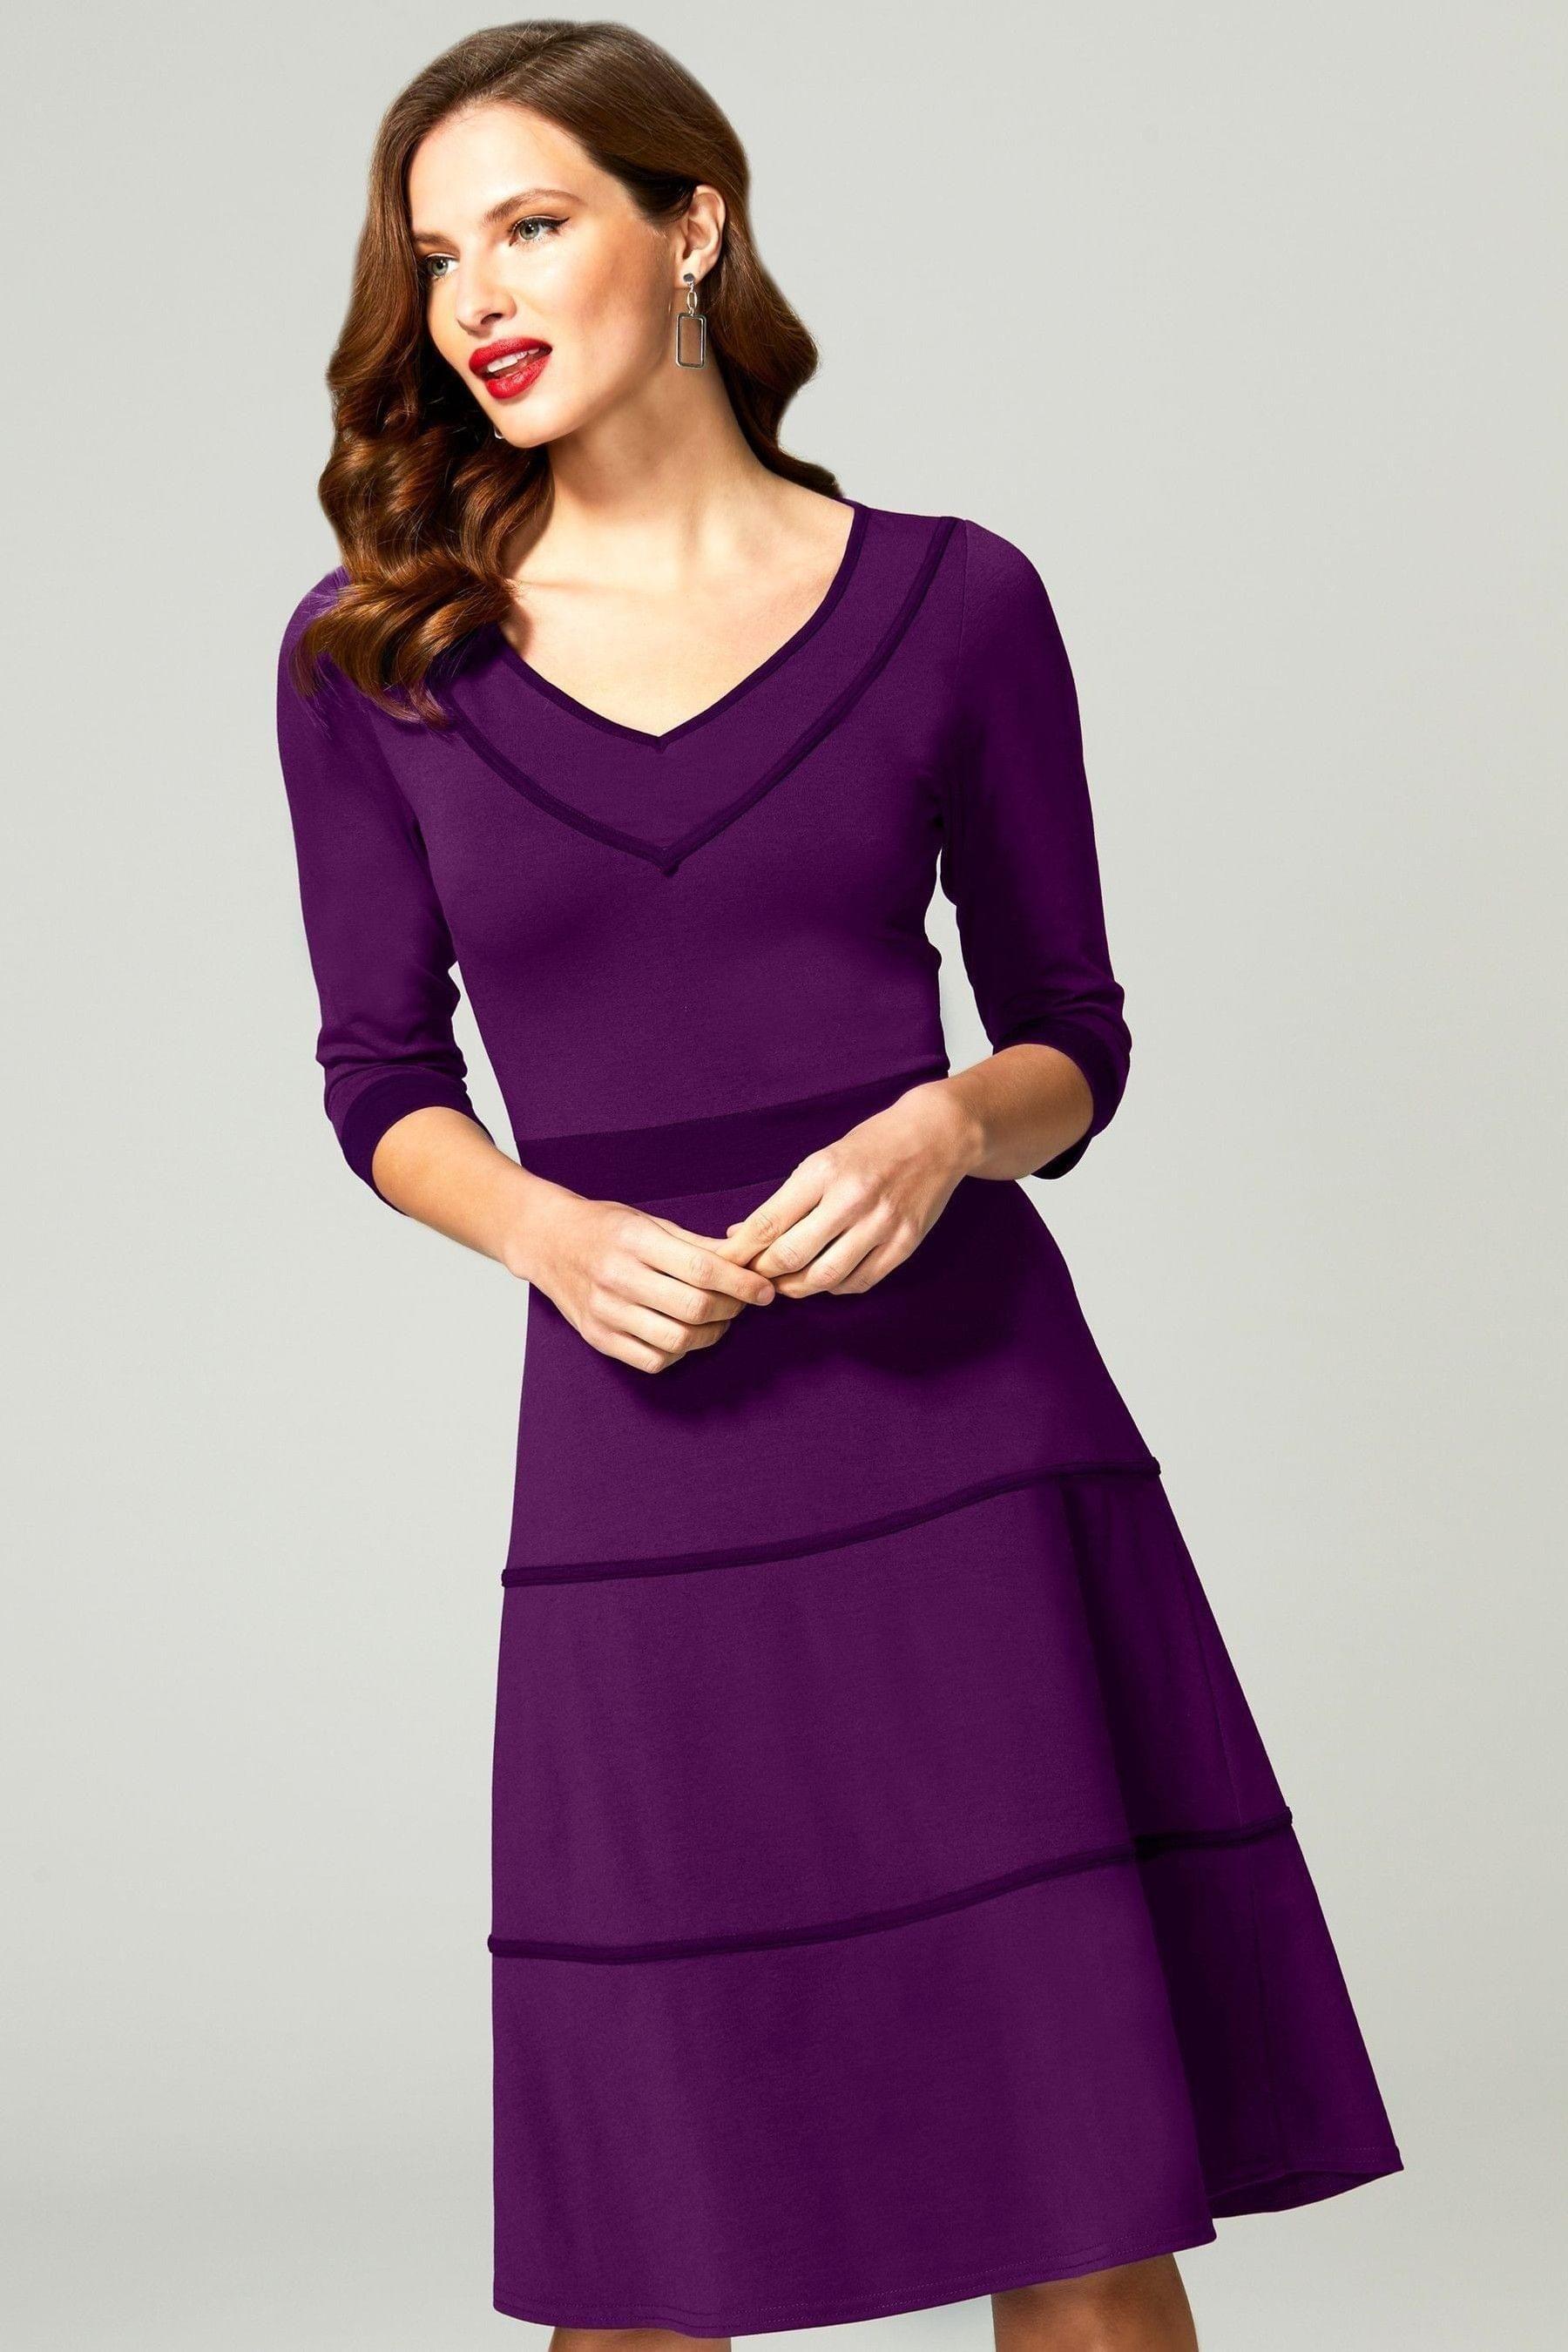 Hotsquash Purple V Neck Dress With Contrast Piping 155 Dresses V Neck Dress Womens Dresses [ 2700 x 1800 Pixel ]